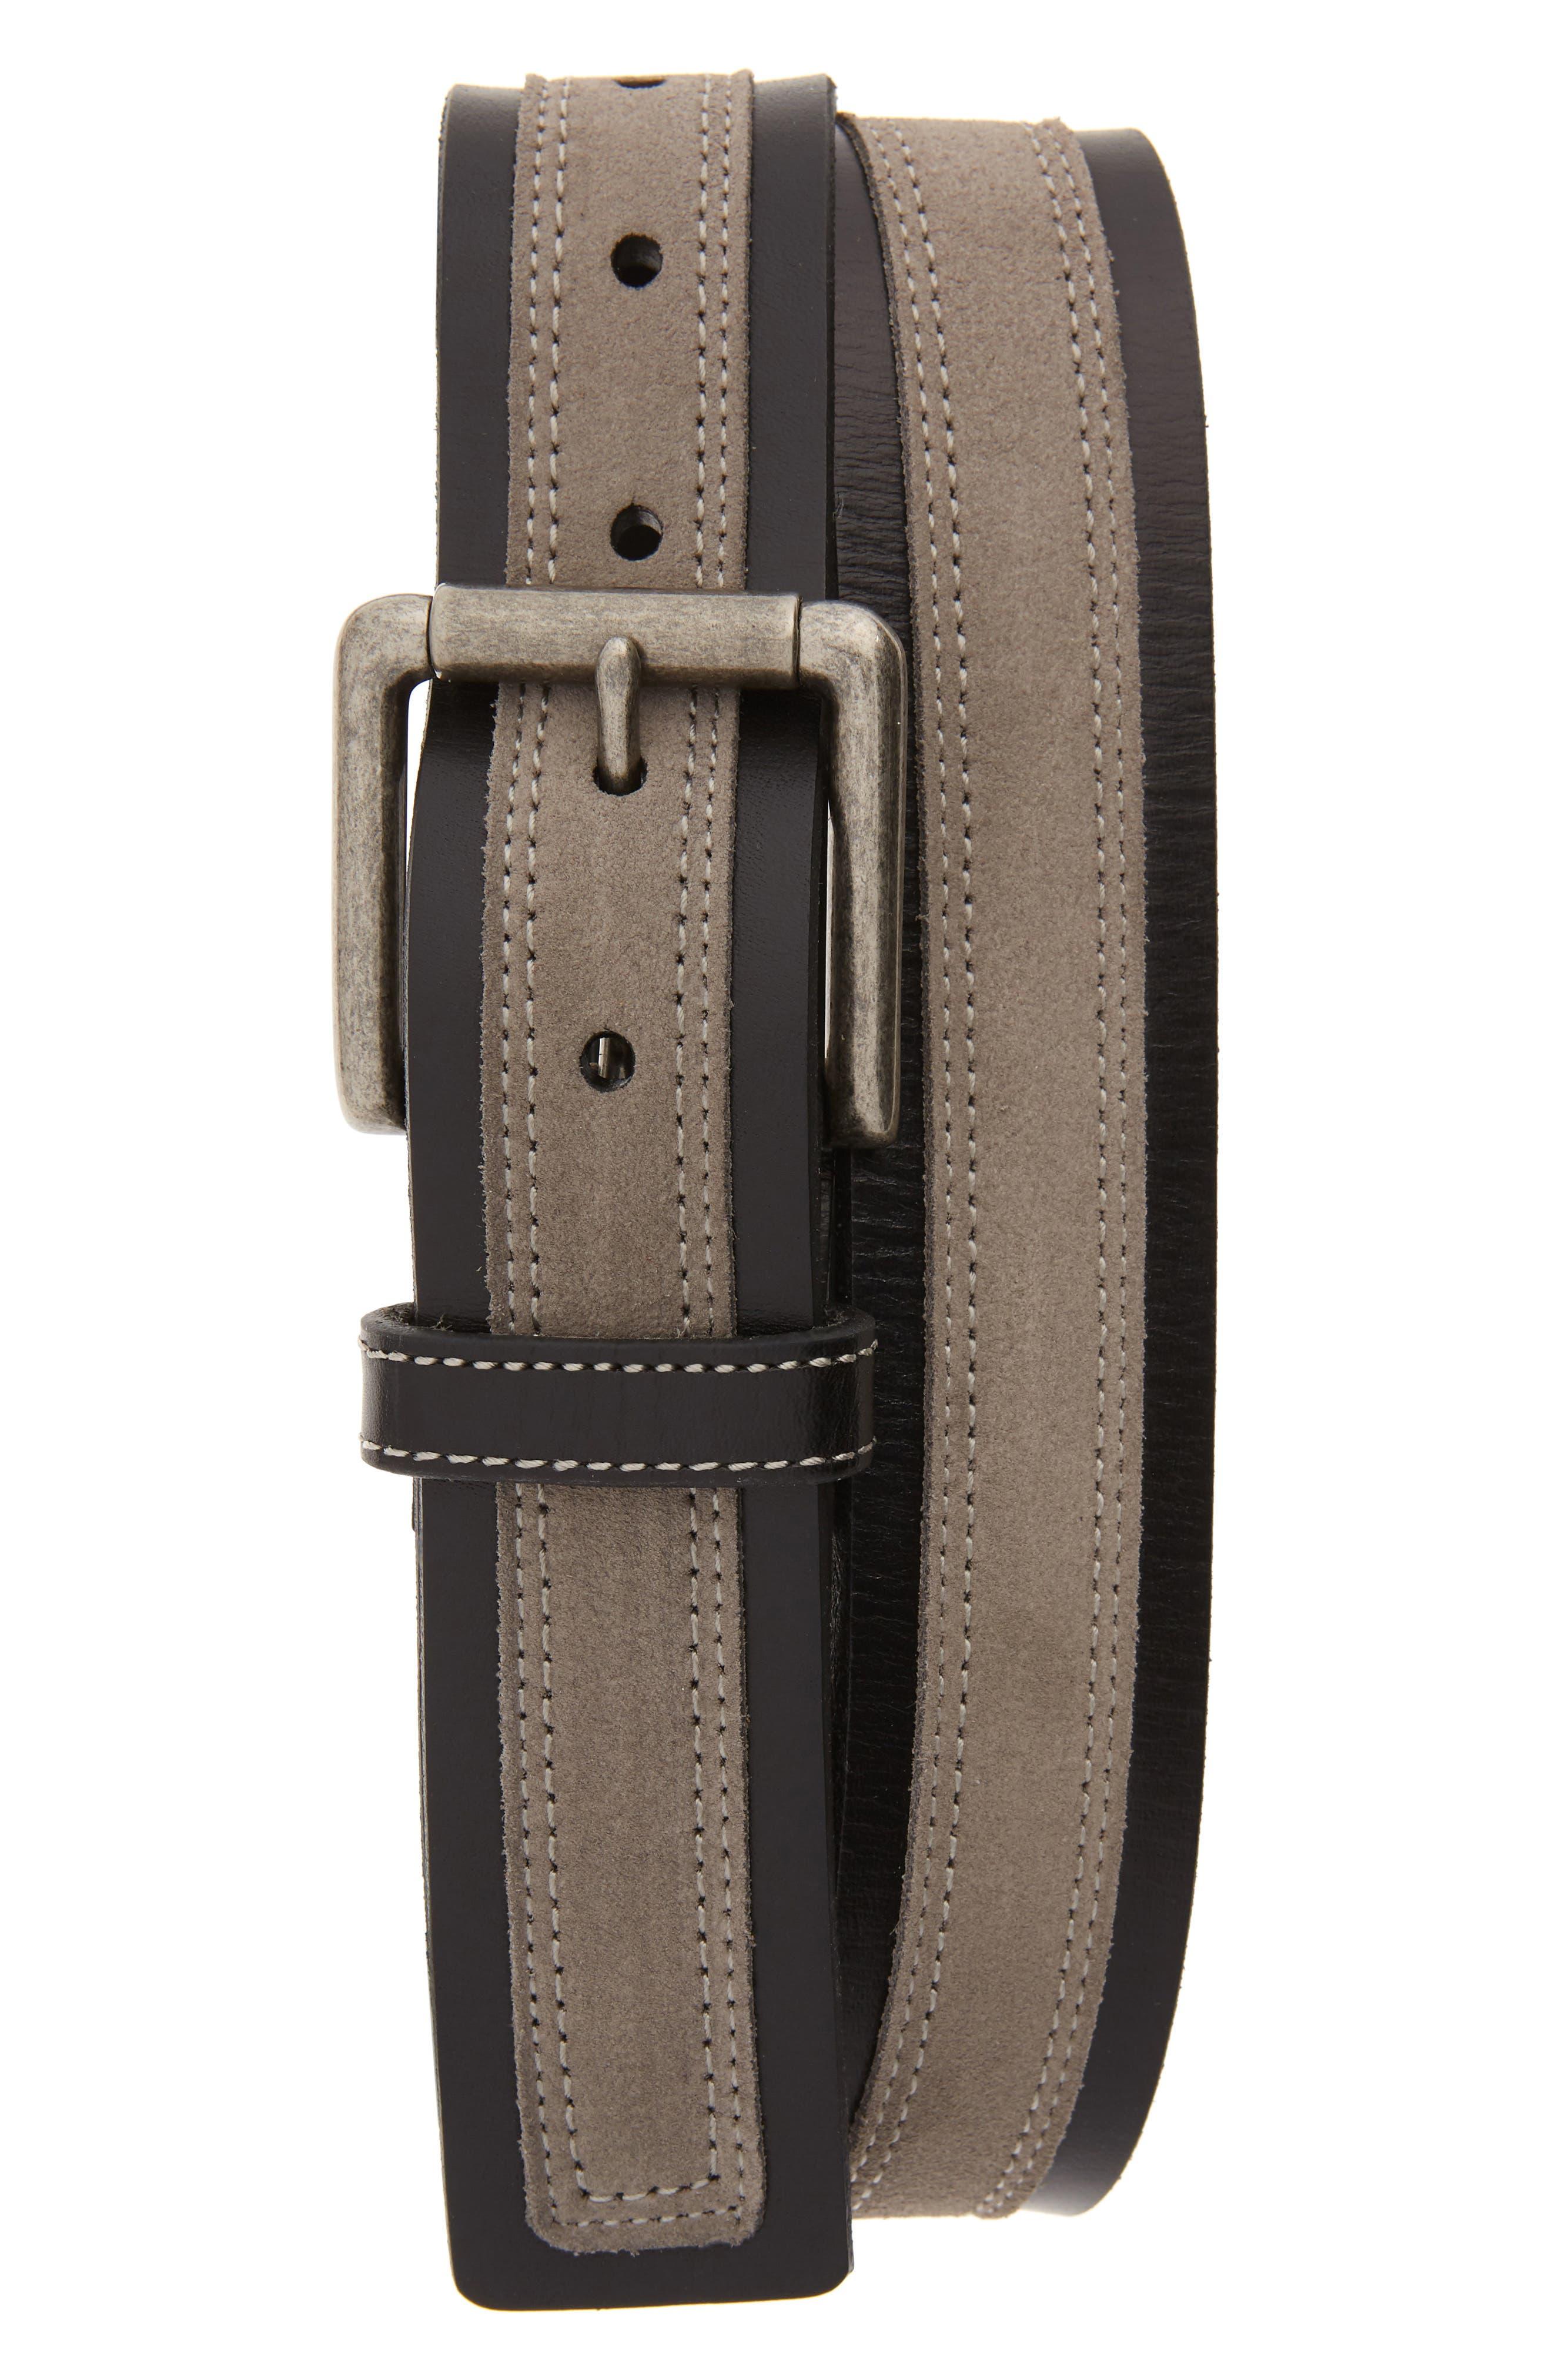 Johnston & Murphy Suede Overlay Belt, Black/gray